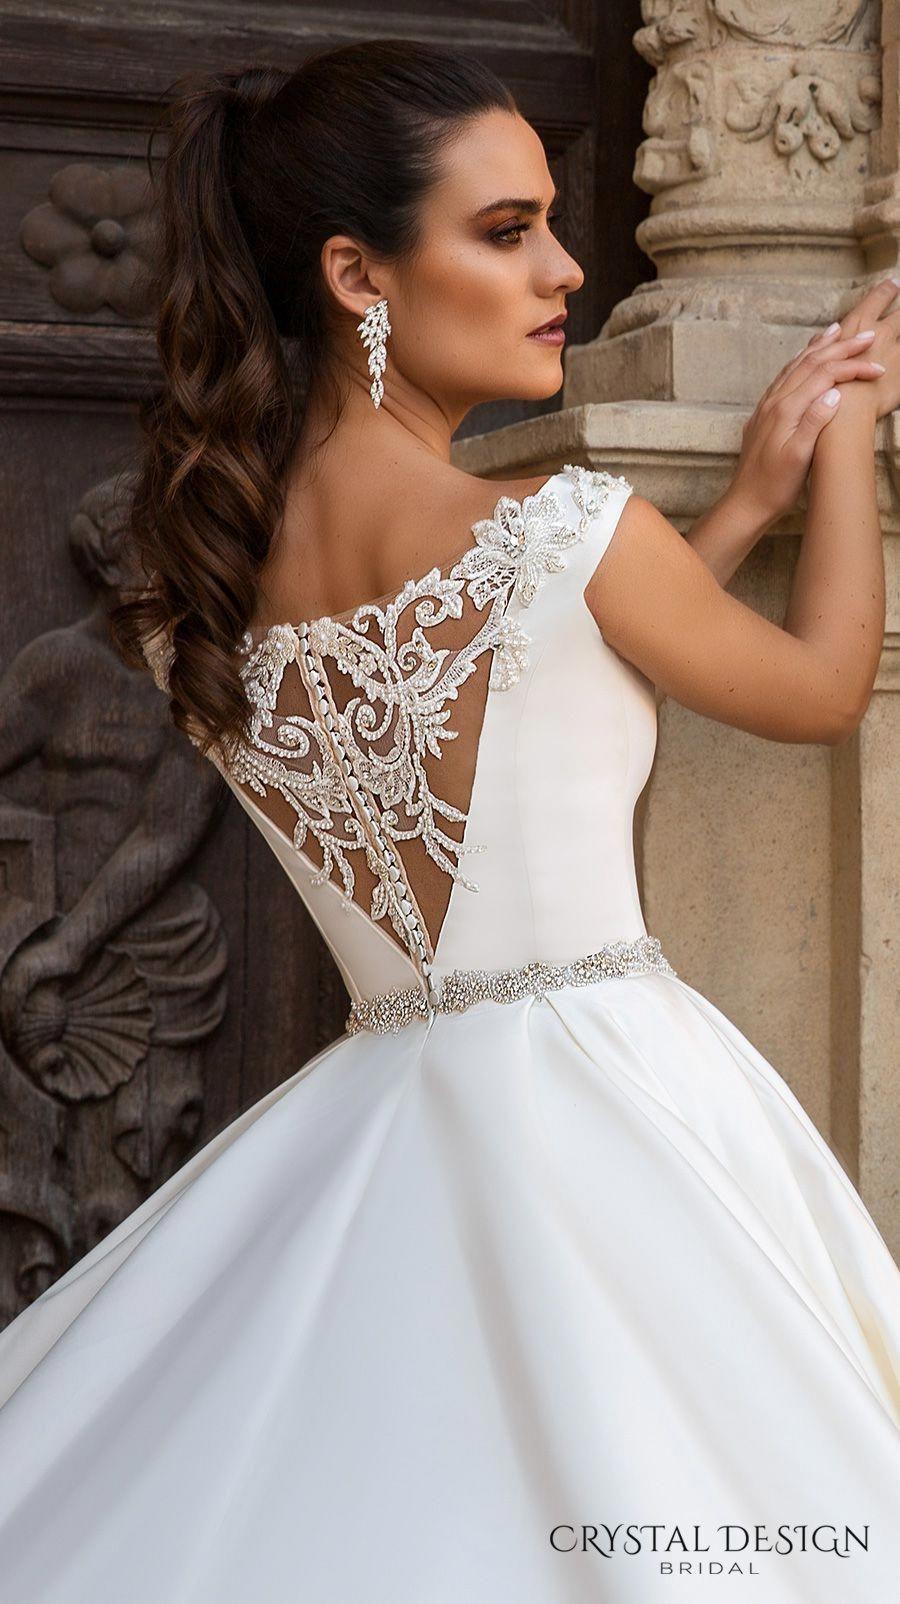 Sell Wedding Dress Buy Dress For Wedding Inexpensive